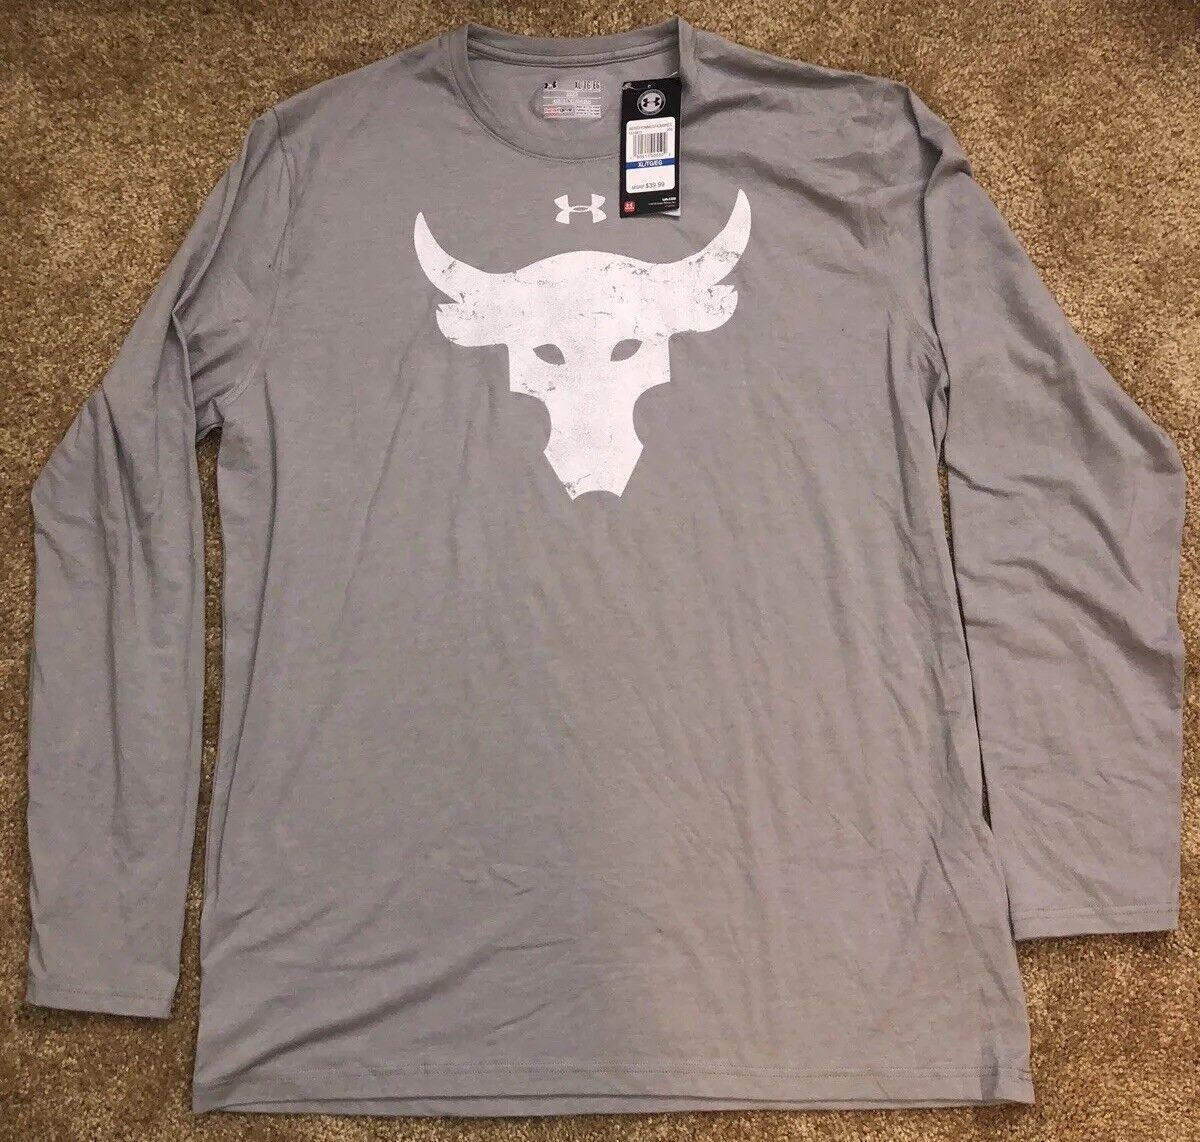 Under Armour Project Rock Brahma Bull Gray Long Sleeve T-Shirt Size Medium